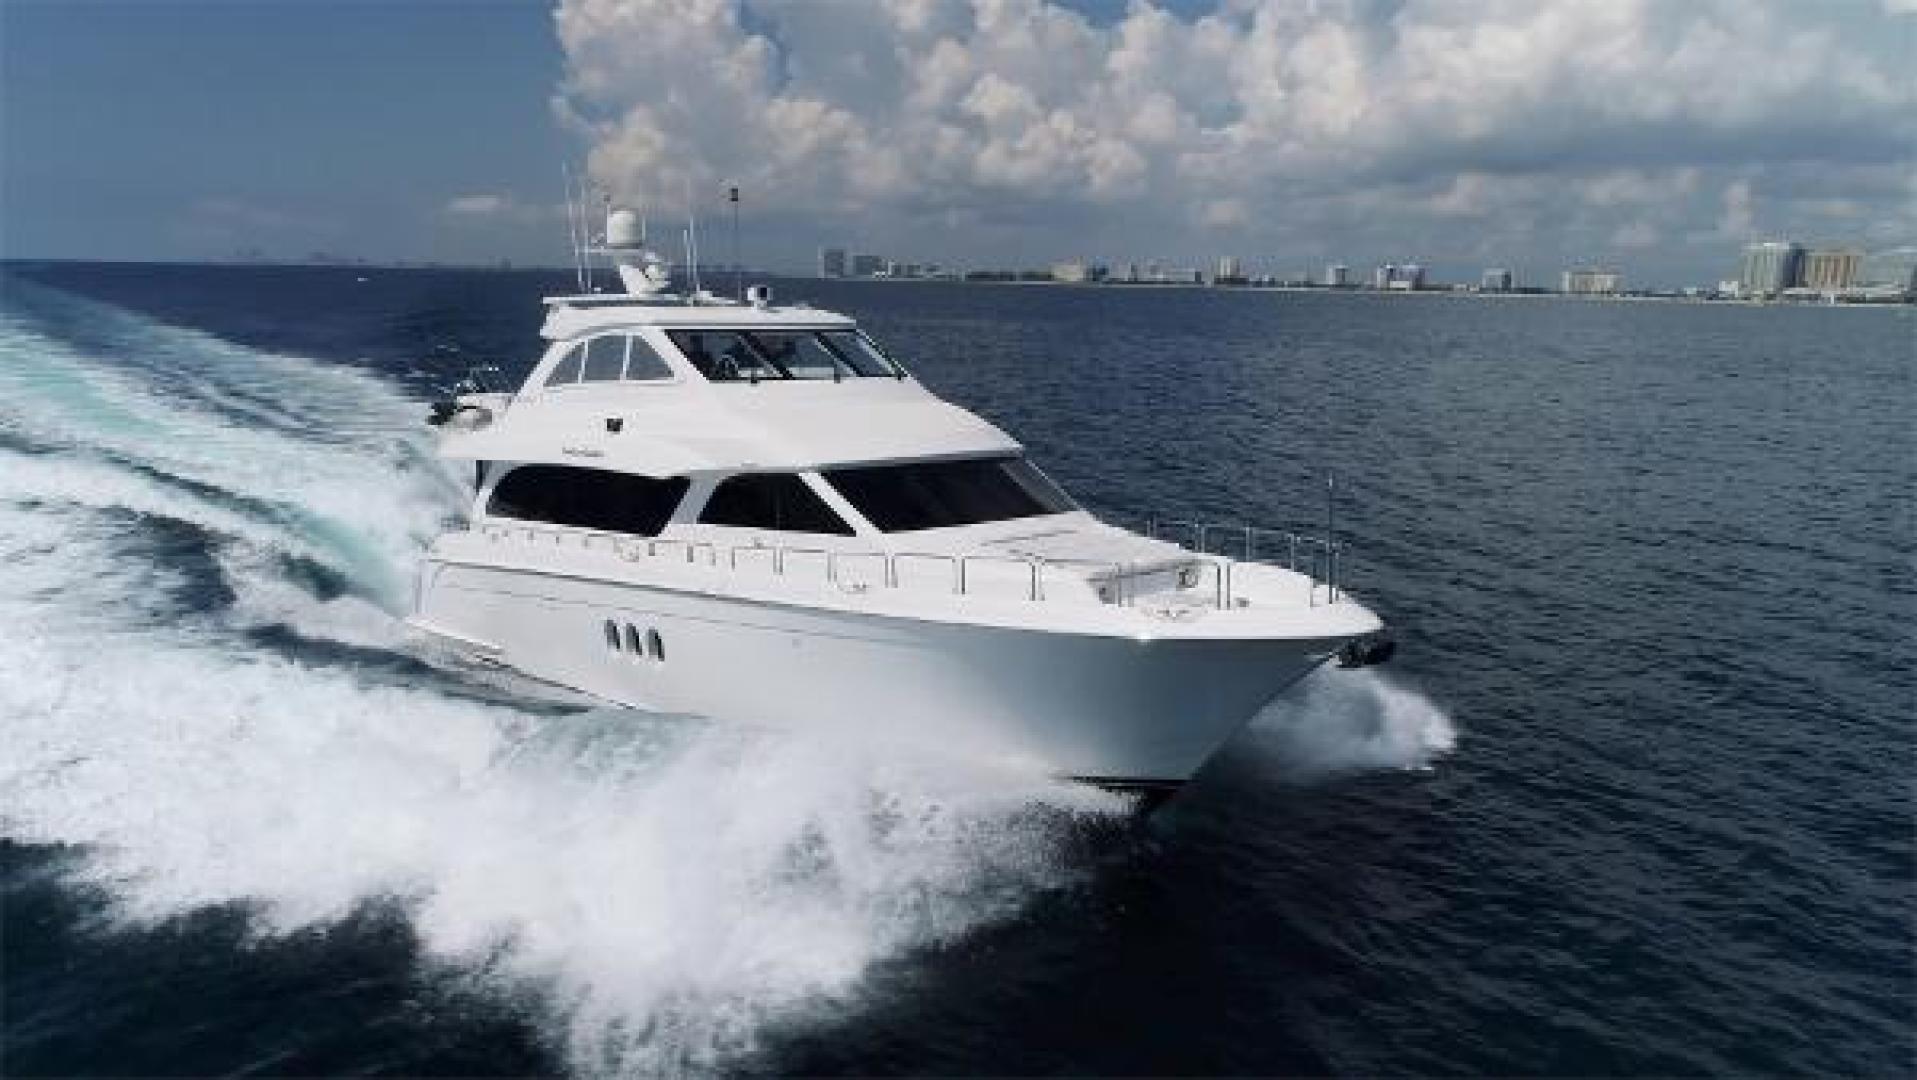 Custom Boat Plexiglass Windshield24 3//4 Inch Bronze Tinted